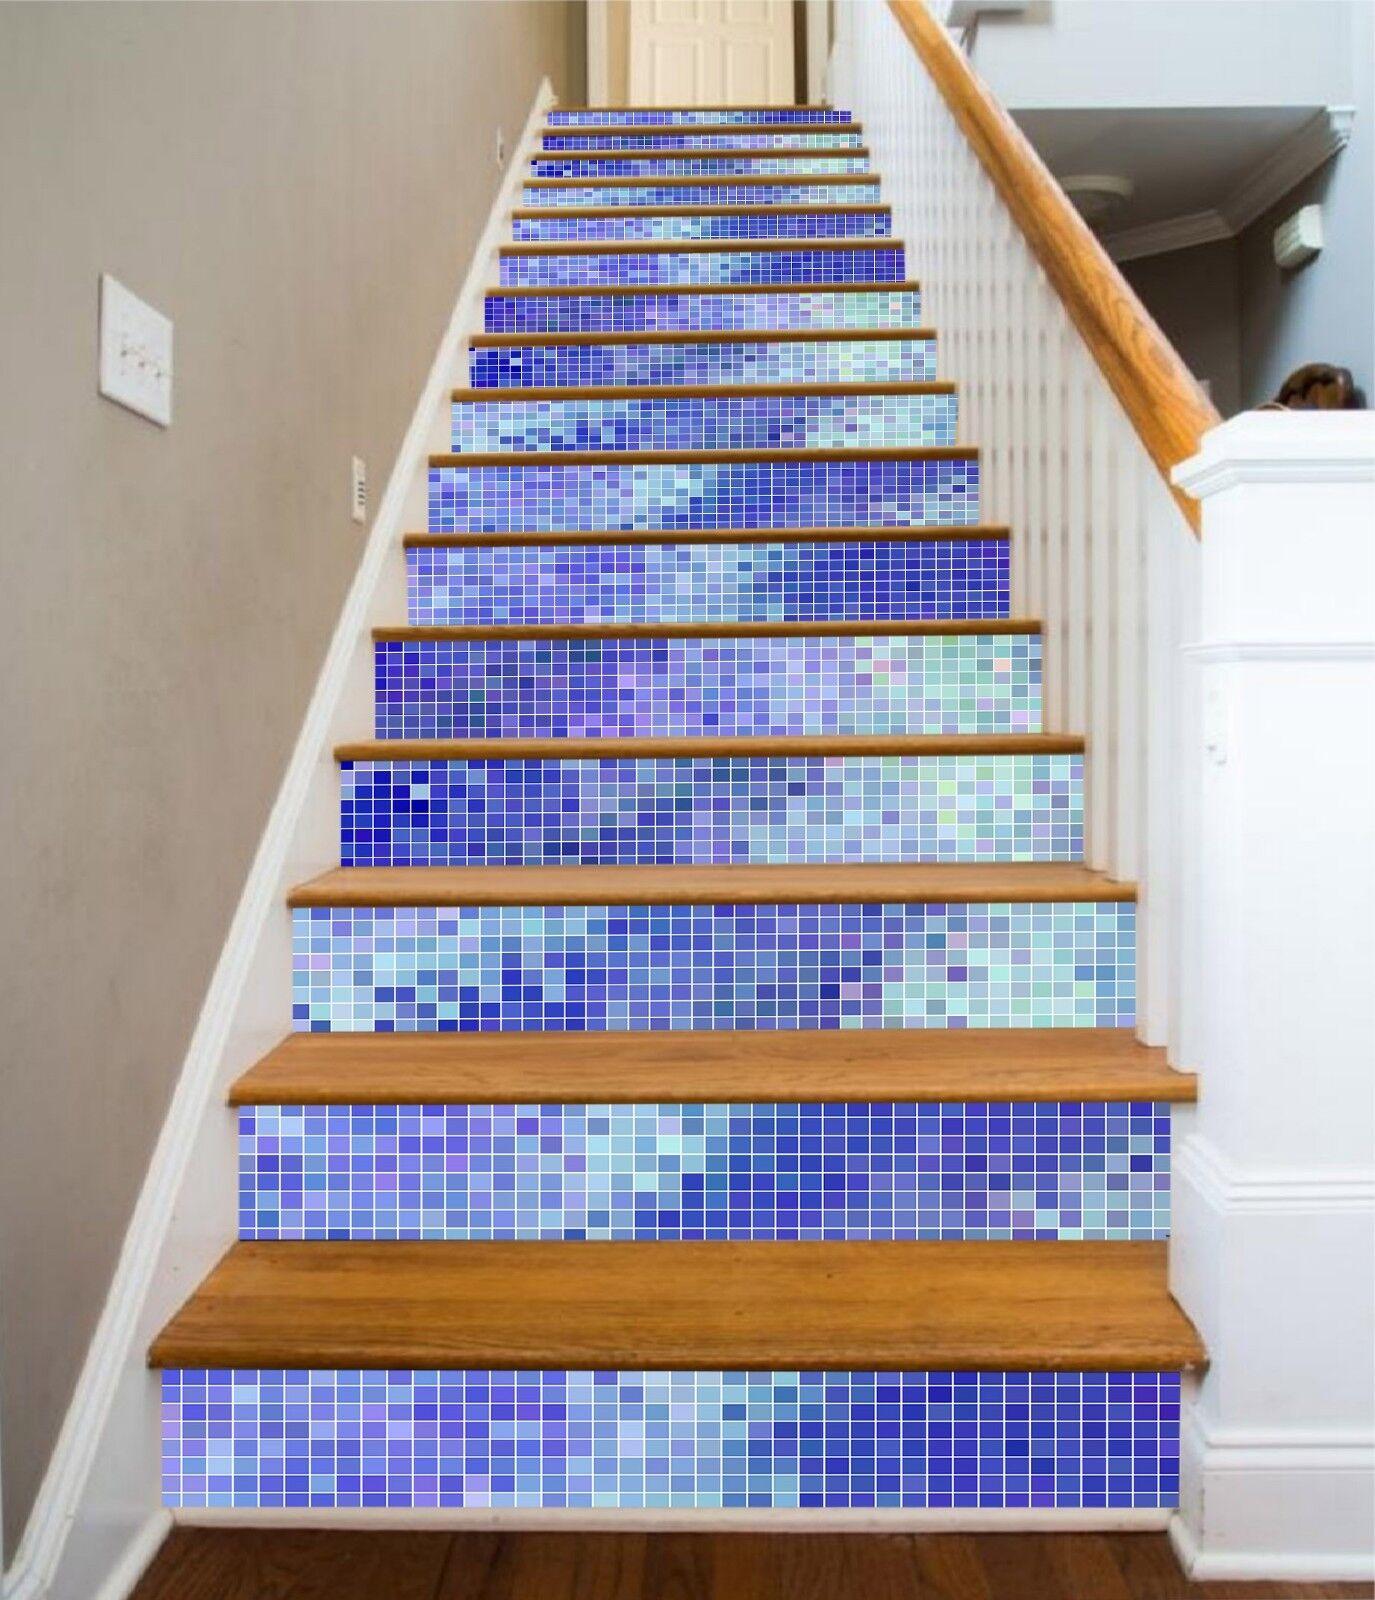 3D Gradient bluee 73 Tile Marble Stair Risers Photo Mural Vinyl Decal Wallpaper